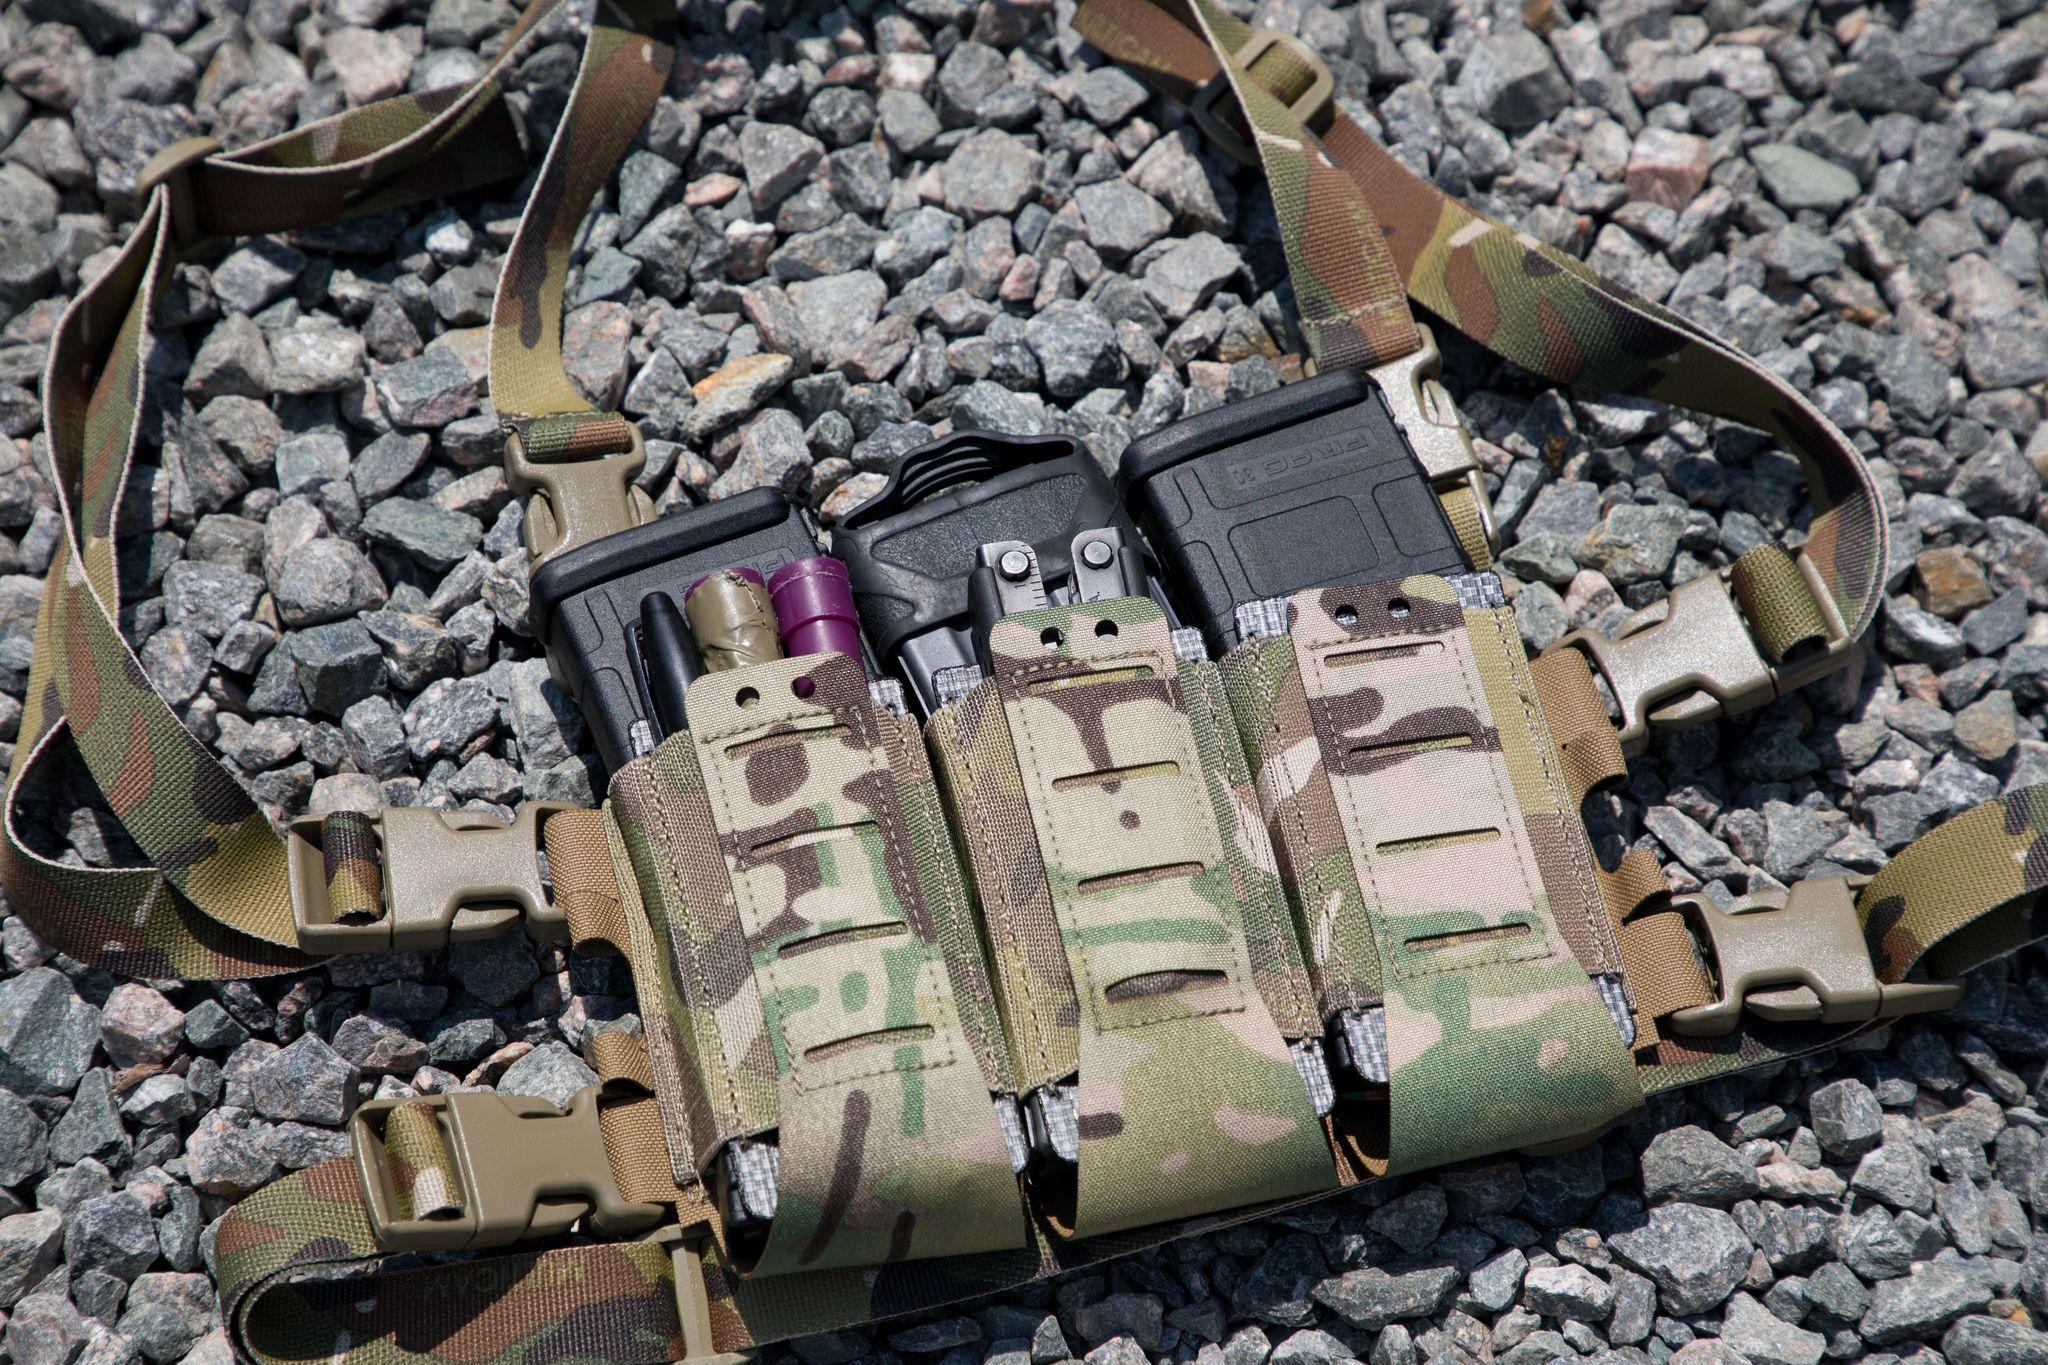 unobtaInium gear sleds placard chest rig mag pouch tactical vest